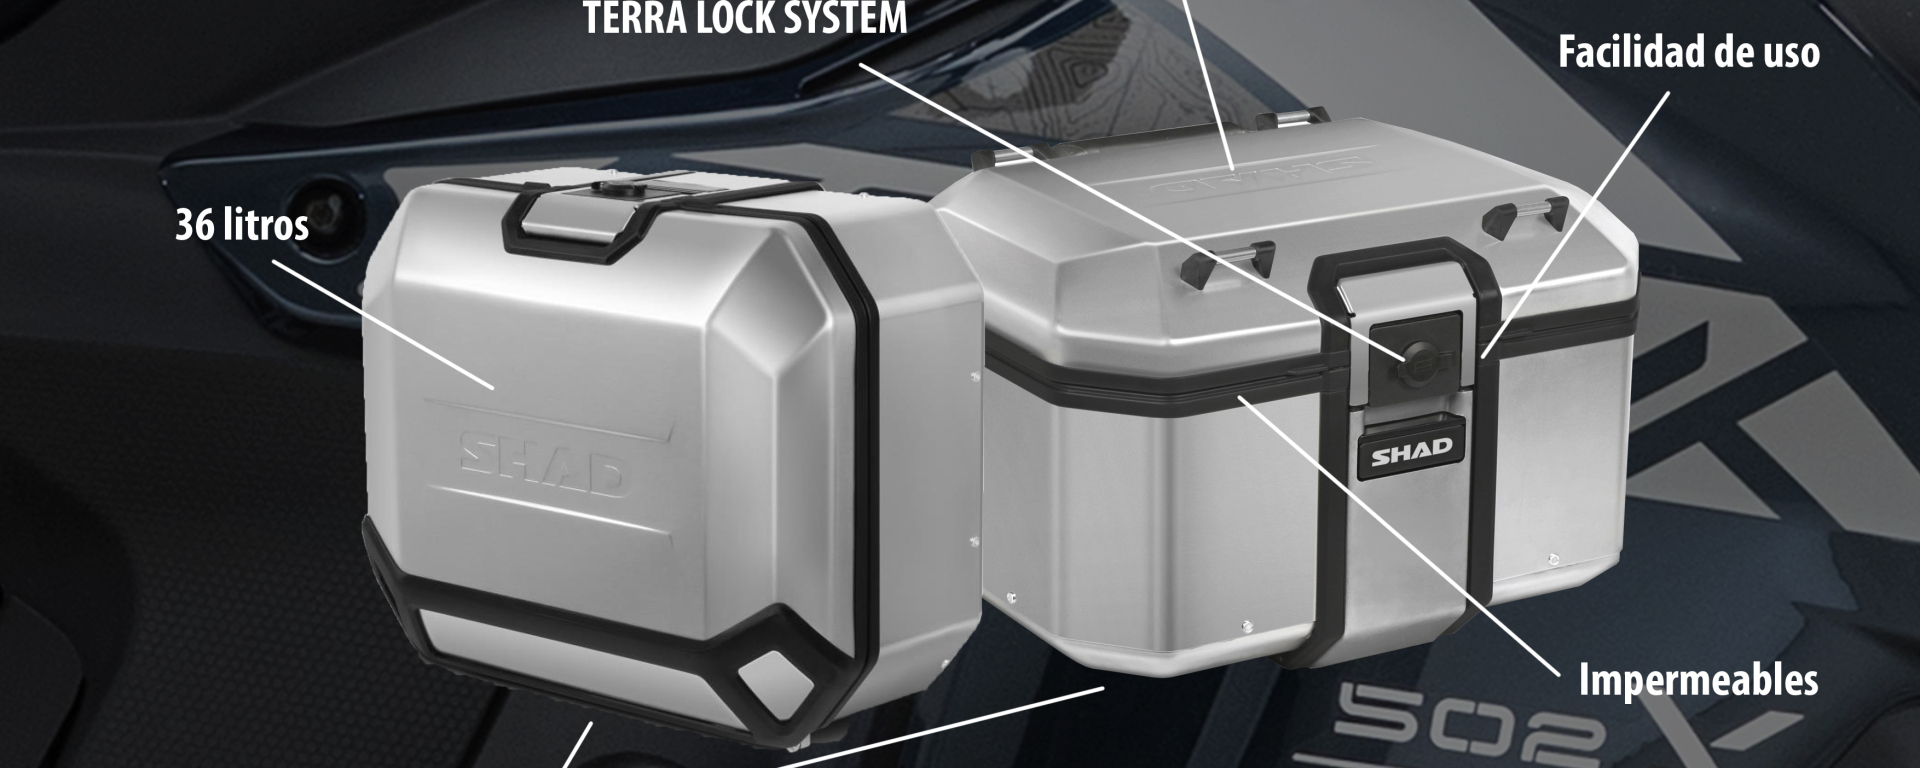 TRK 502 X con maletas Terra